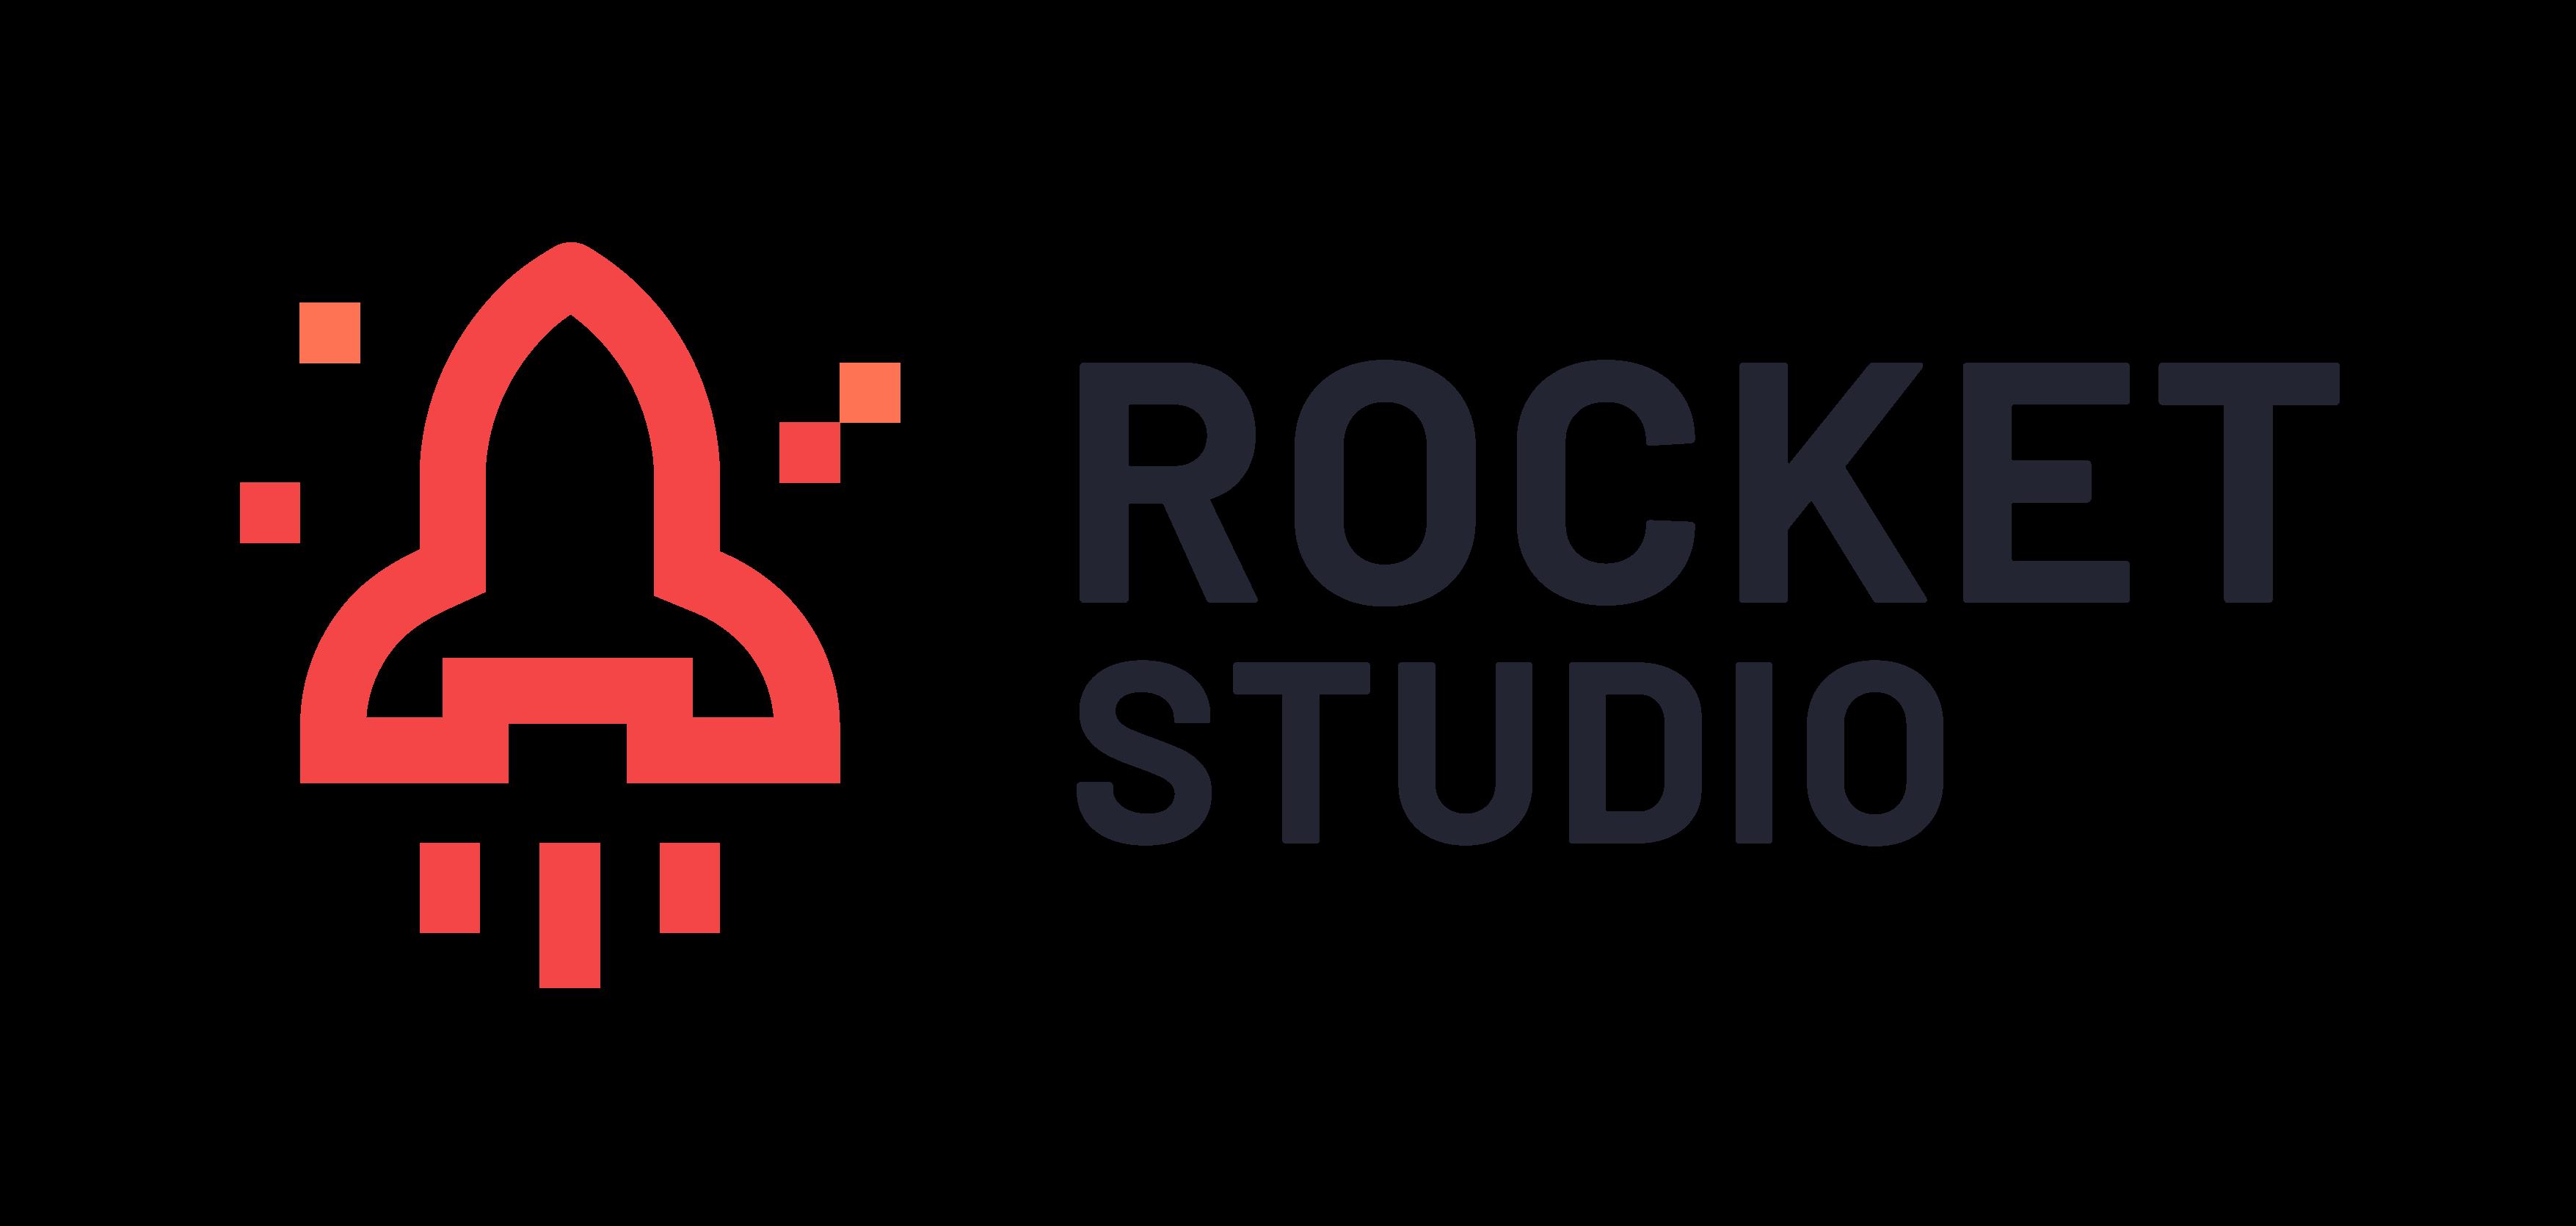 ROCKET_Studio_logo_RGB